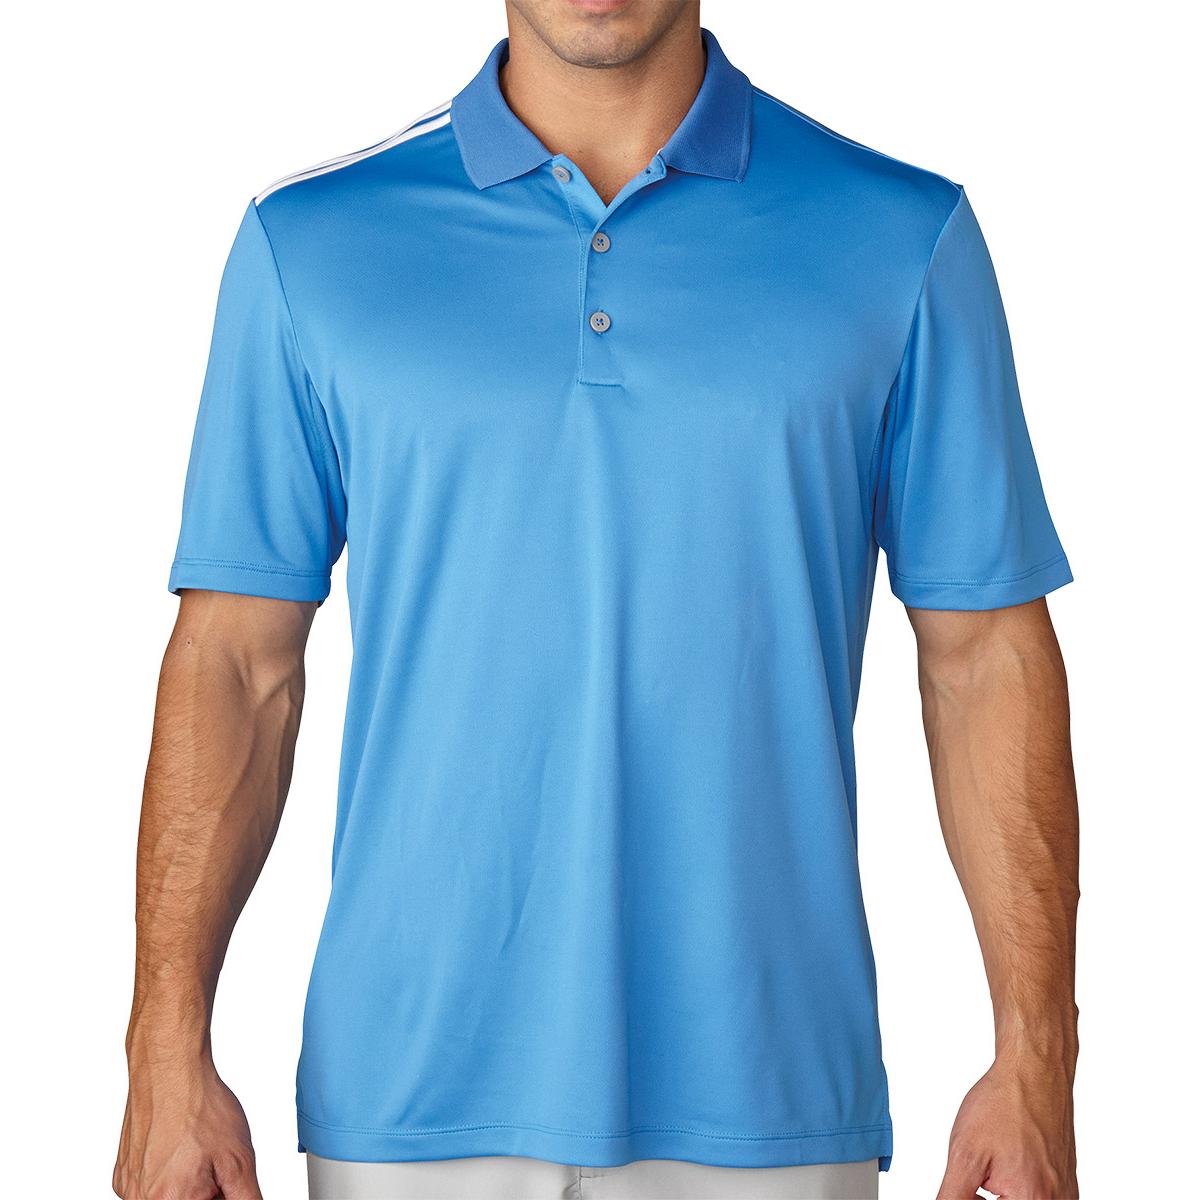 d1d87d33 Adidas Golf Mens Climacool Puremotion 3 Stripe Polo Shirt | Top Mode ...